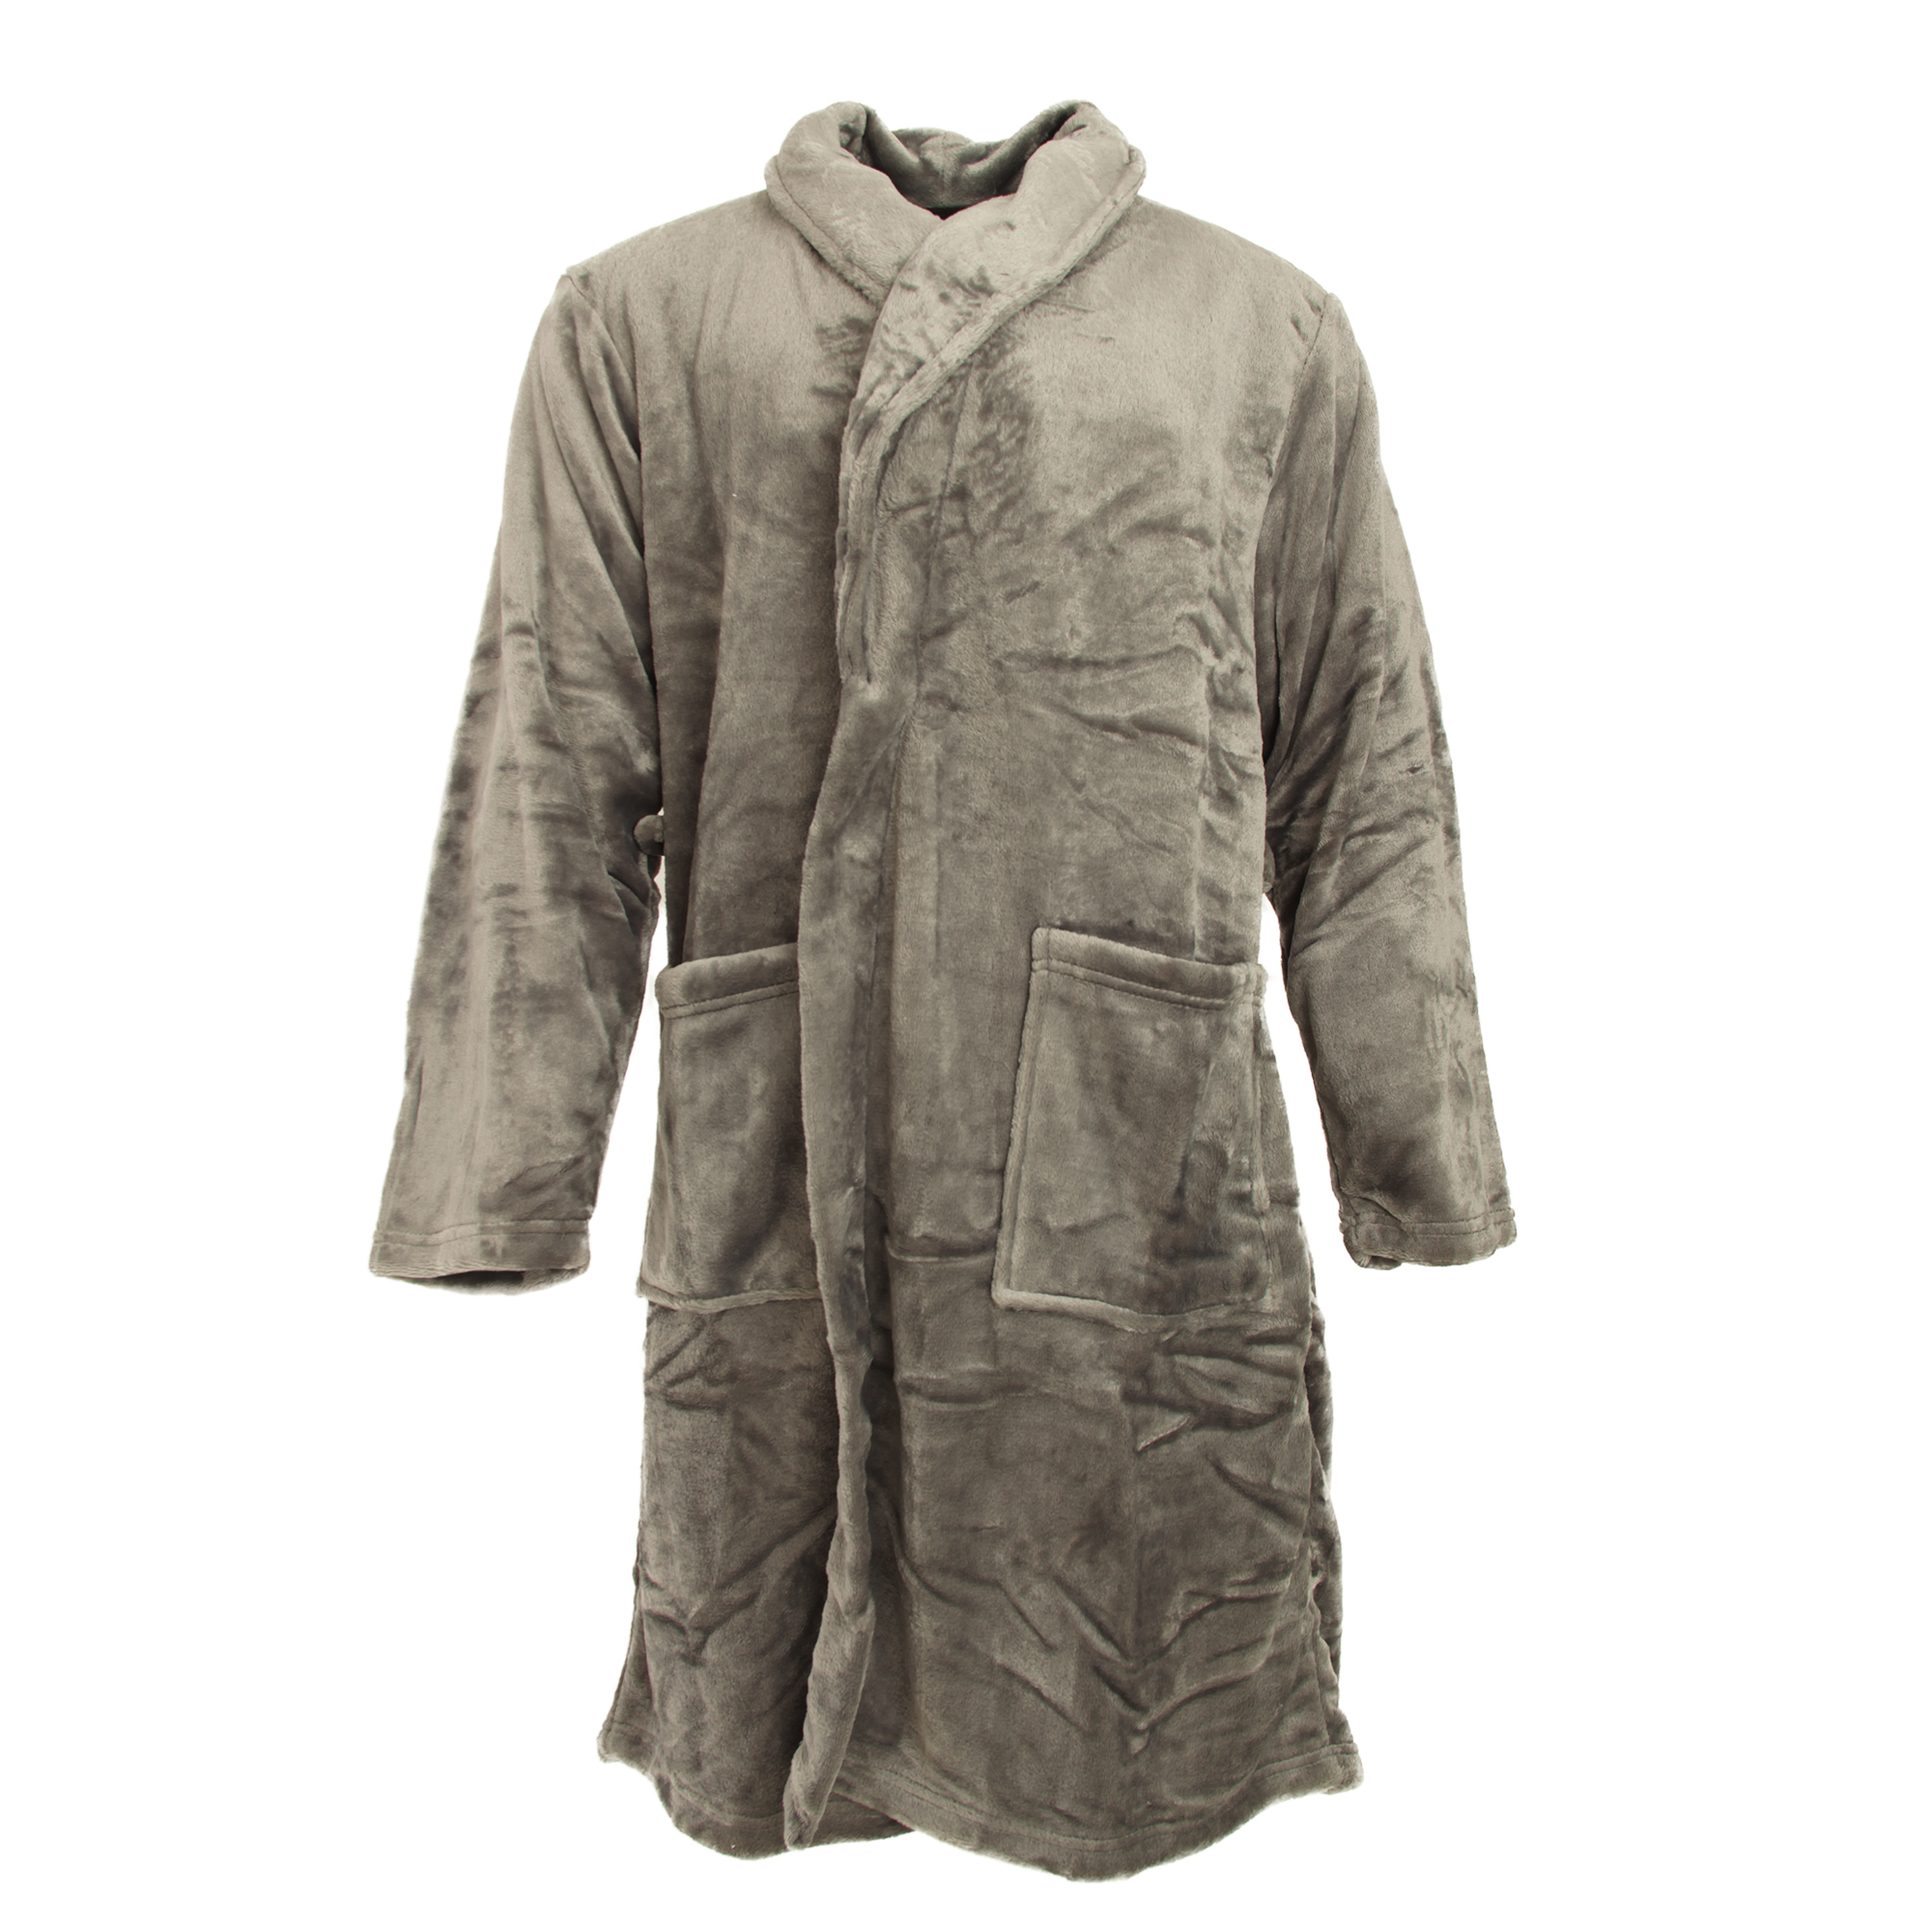 Pierre Roche Mens Luxury Super Soft Dressing Gown Gray 2xl | eBay